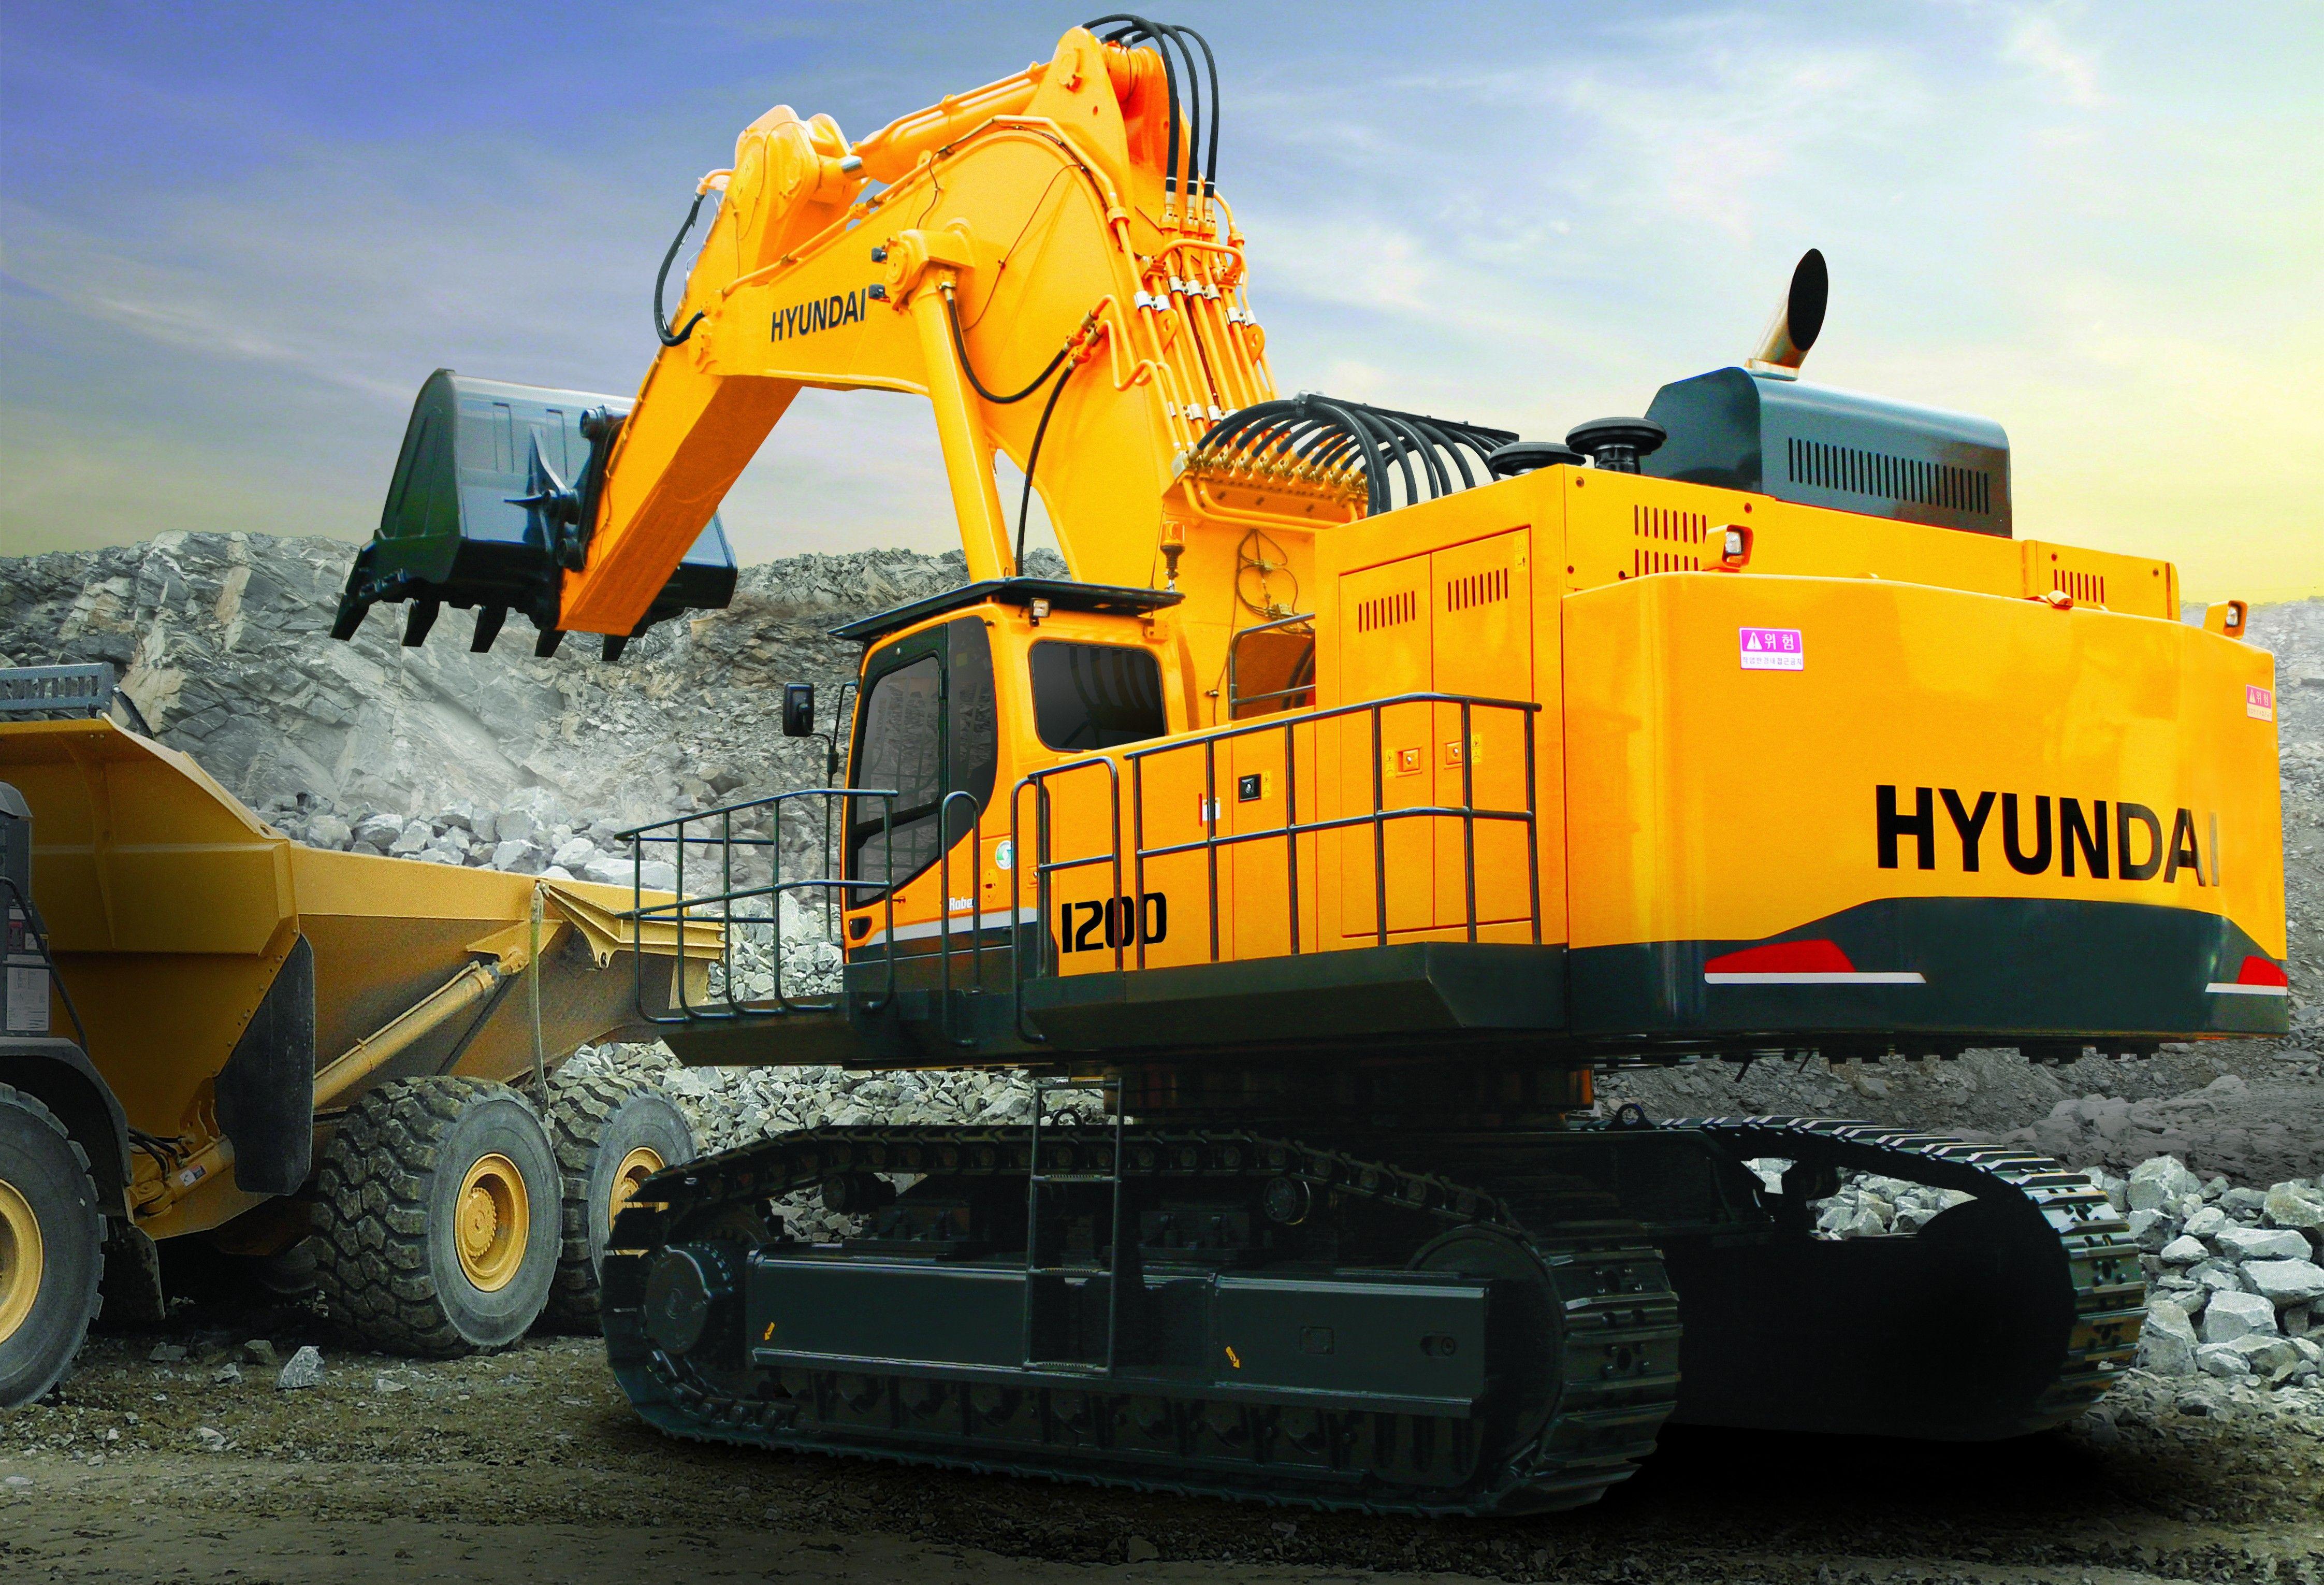 Pin By Kristopher Schreacke On Boulder Supply Hyundai Excavator Tonka Toys